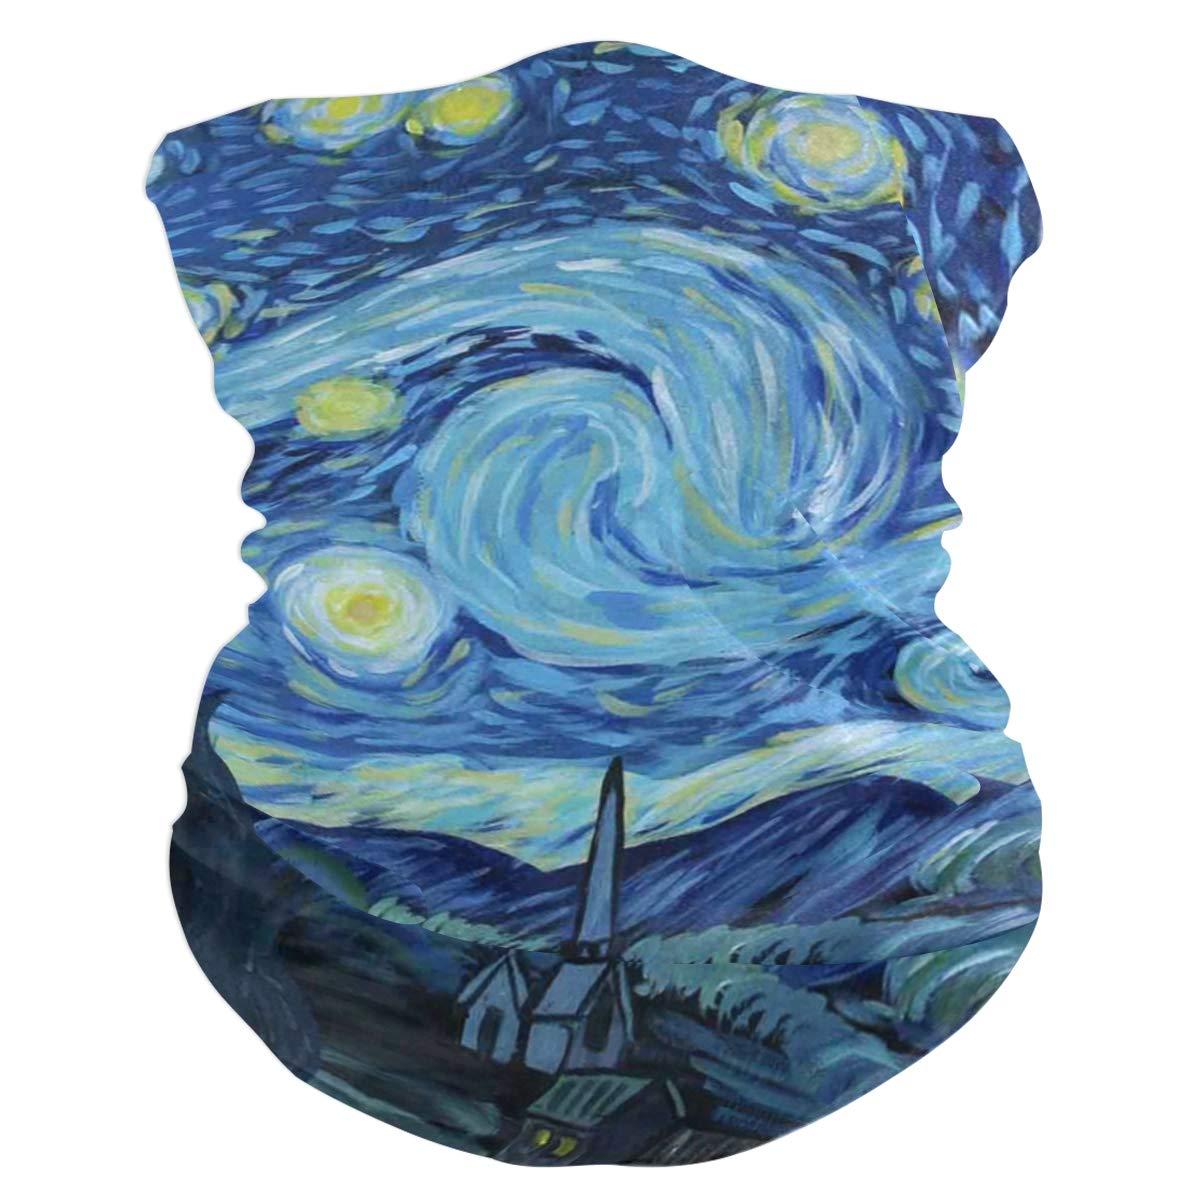 Starry Night Face Mask Sun Shield Neck Gaiter Headband Bandana Tube Scarf Mgic